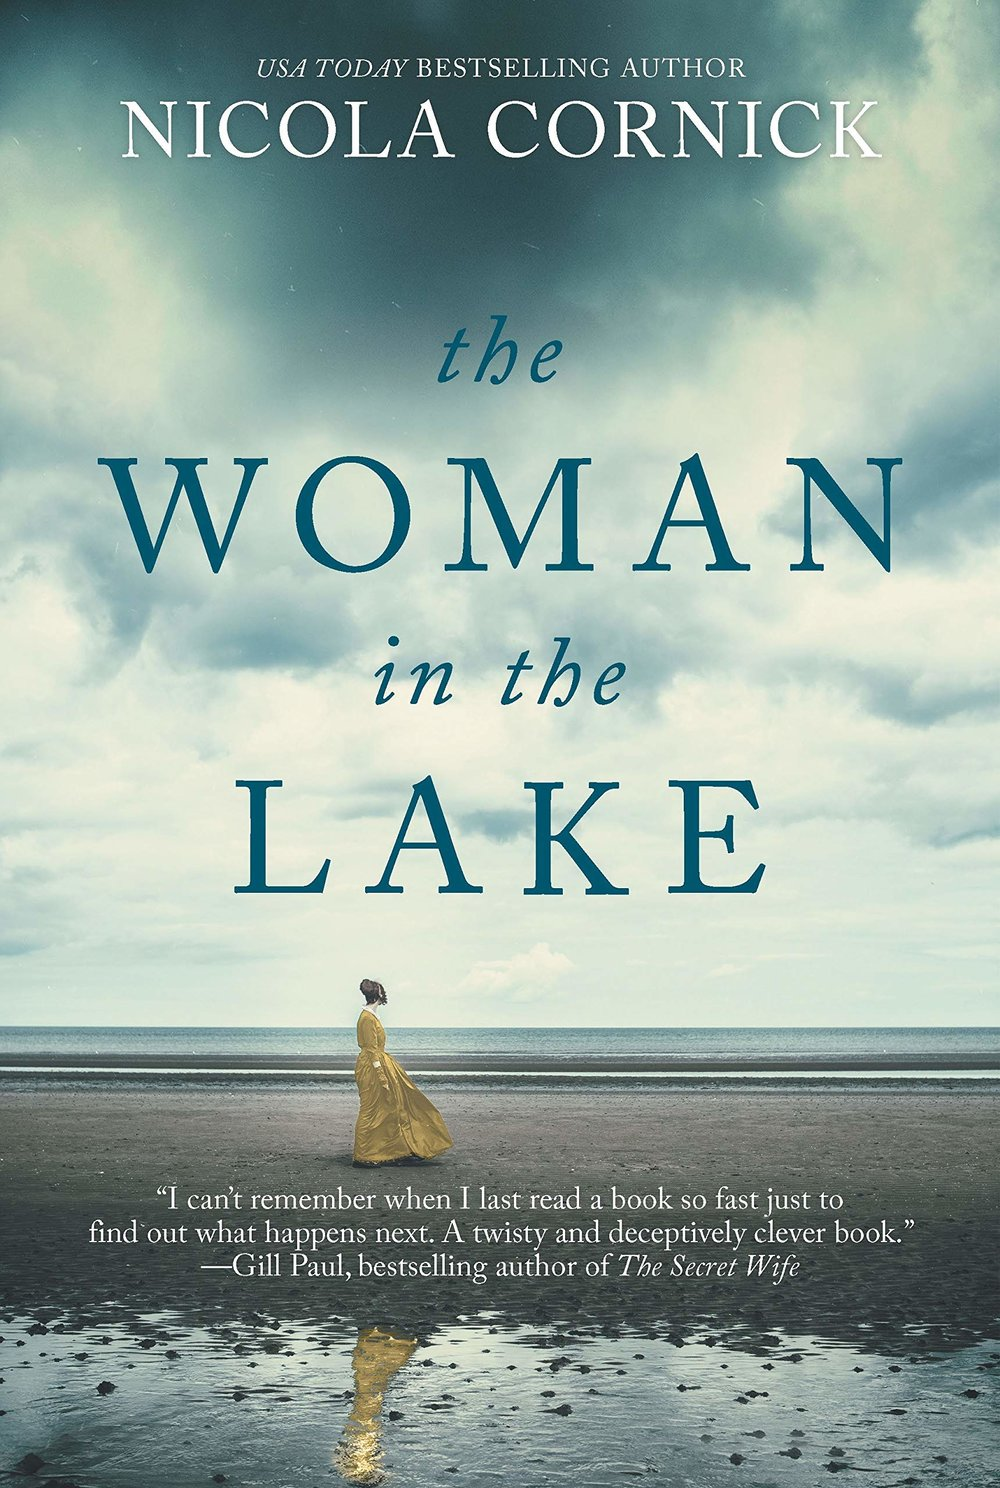 THE WOMAN IN THE LAKE by Nicola Cornick